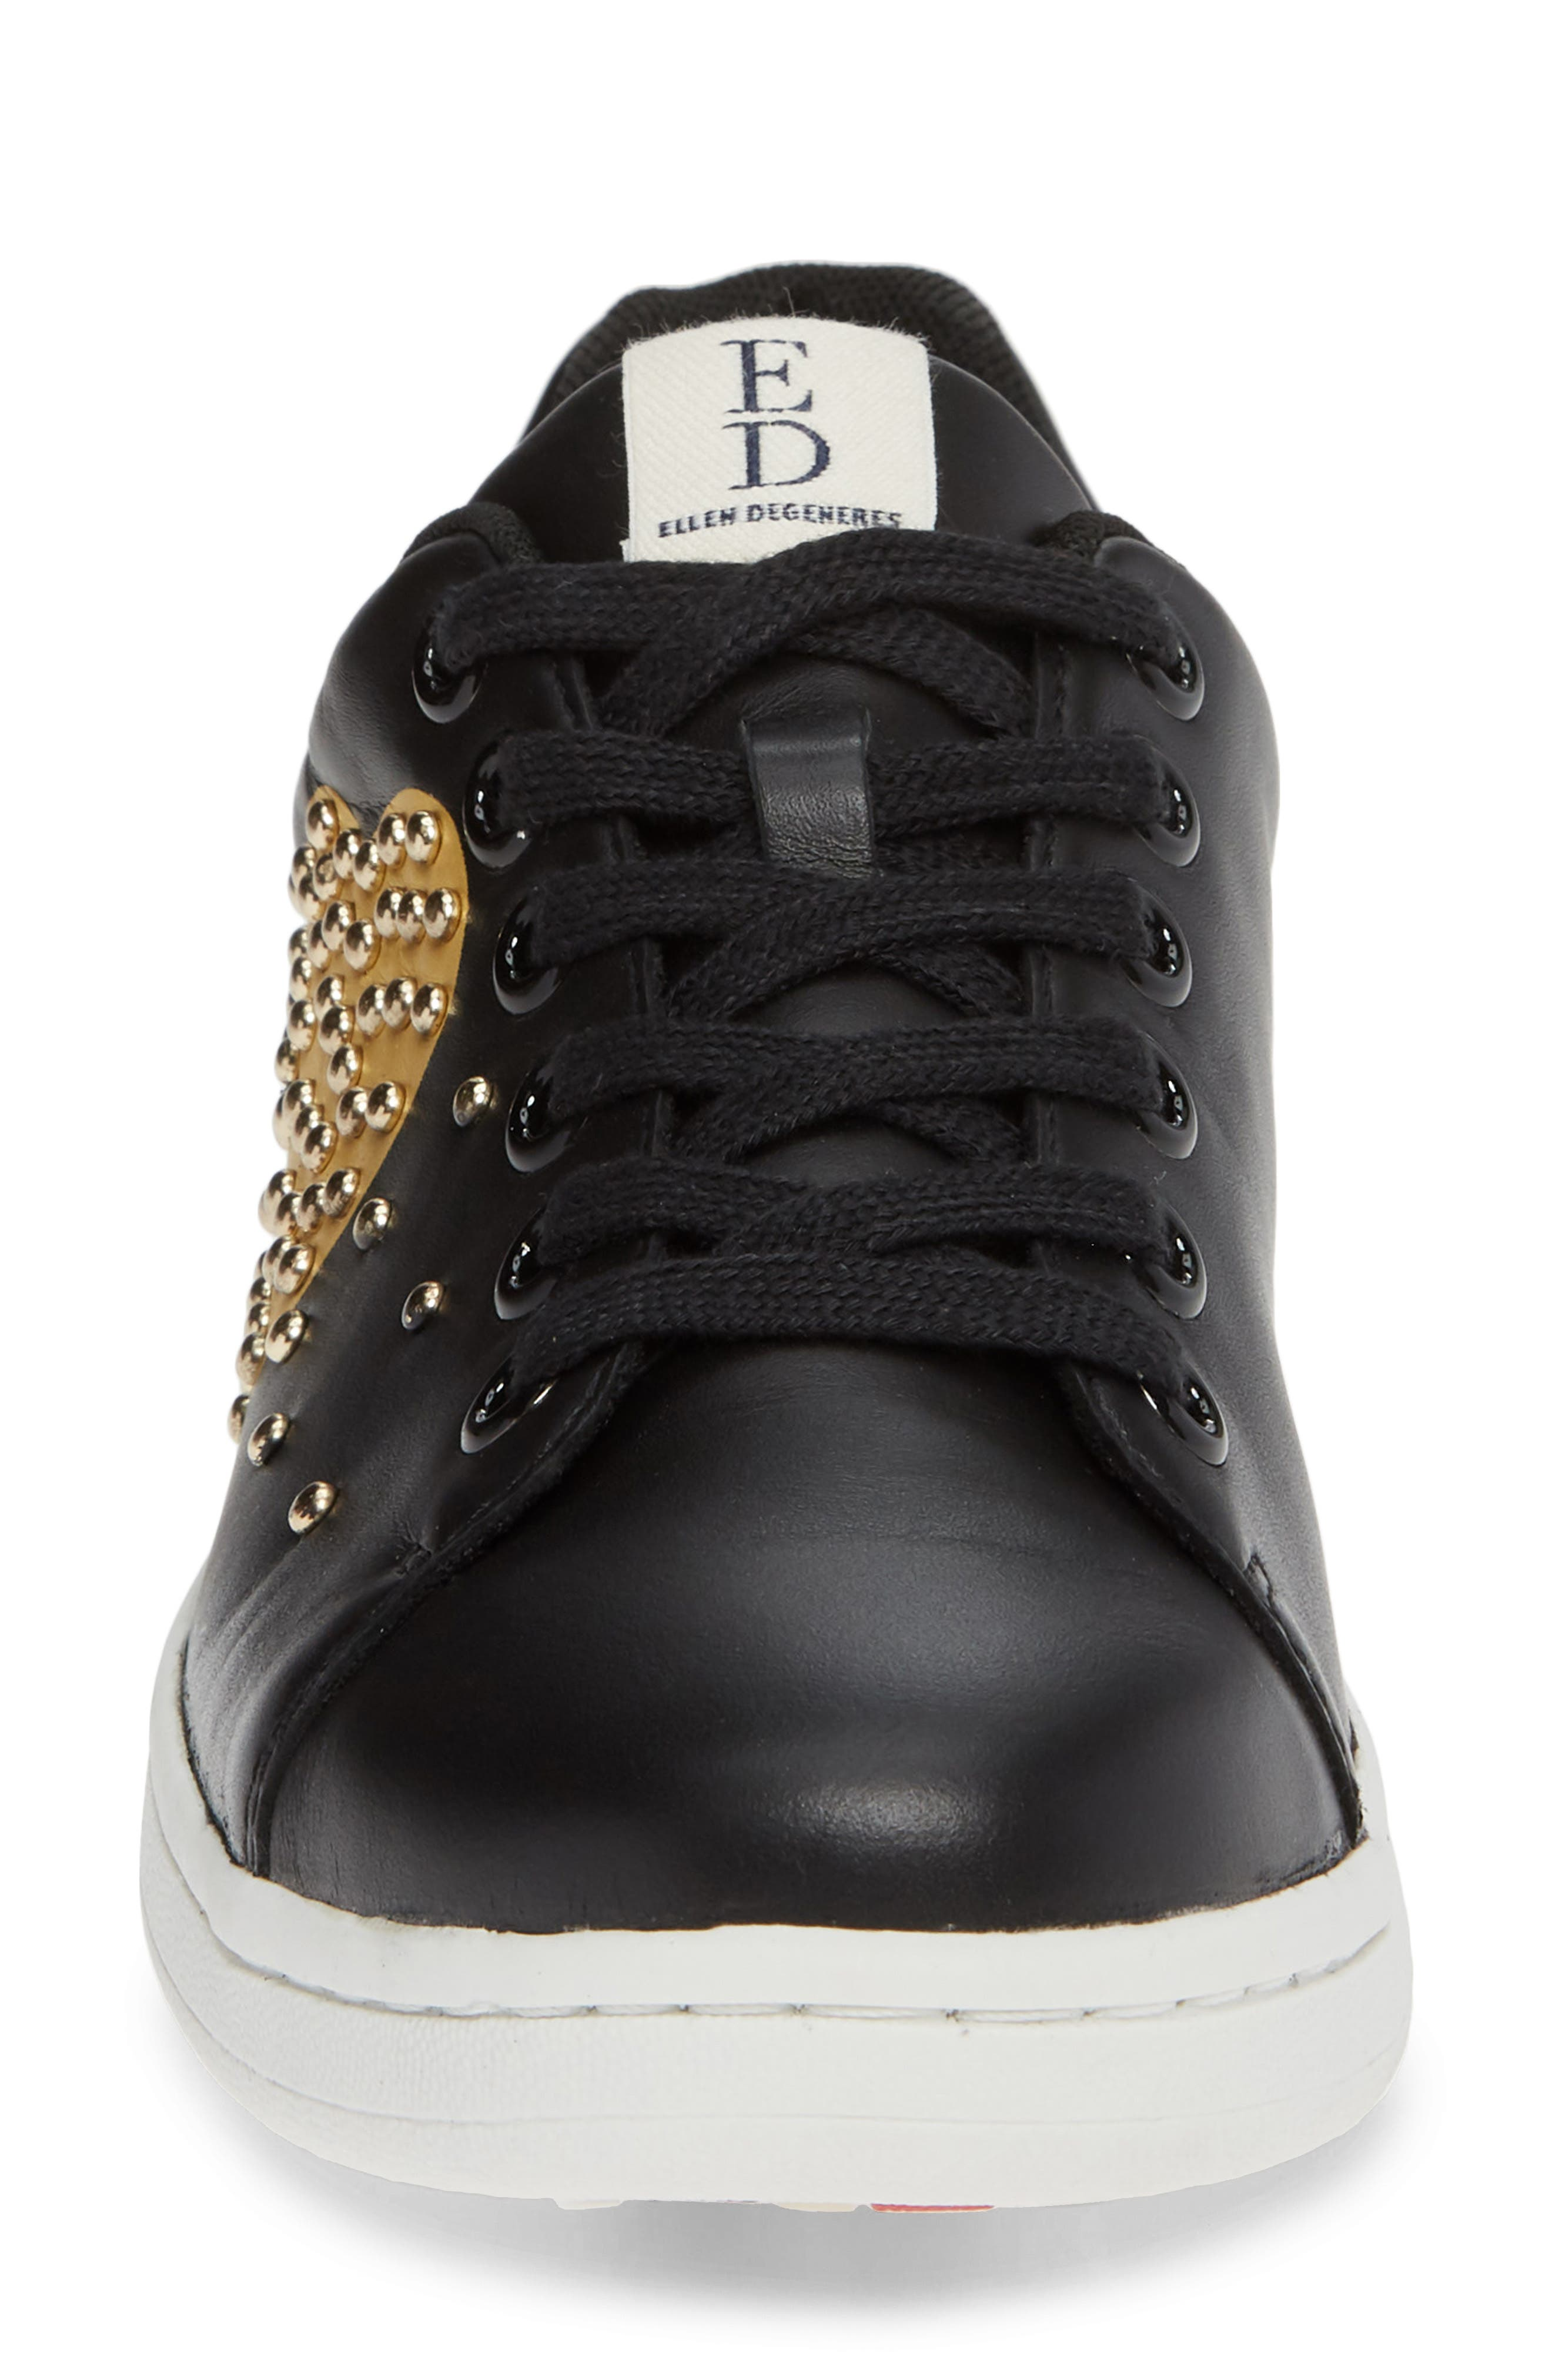 Chamour Sneaker,                             Alternate thumbnail 4, color,                             BLACK/ GOLD LEATHER